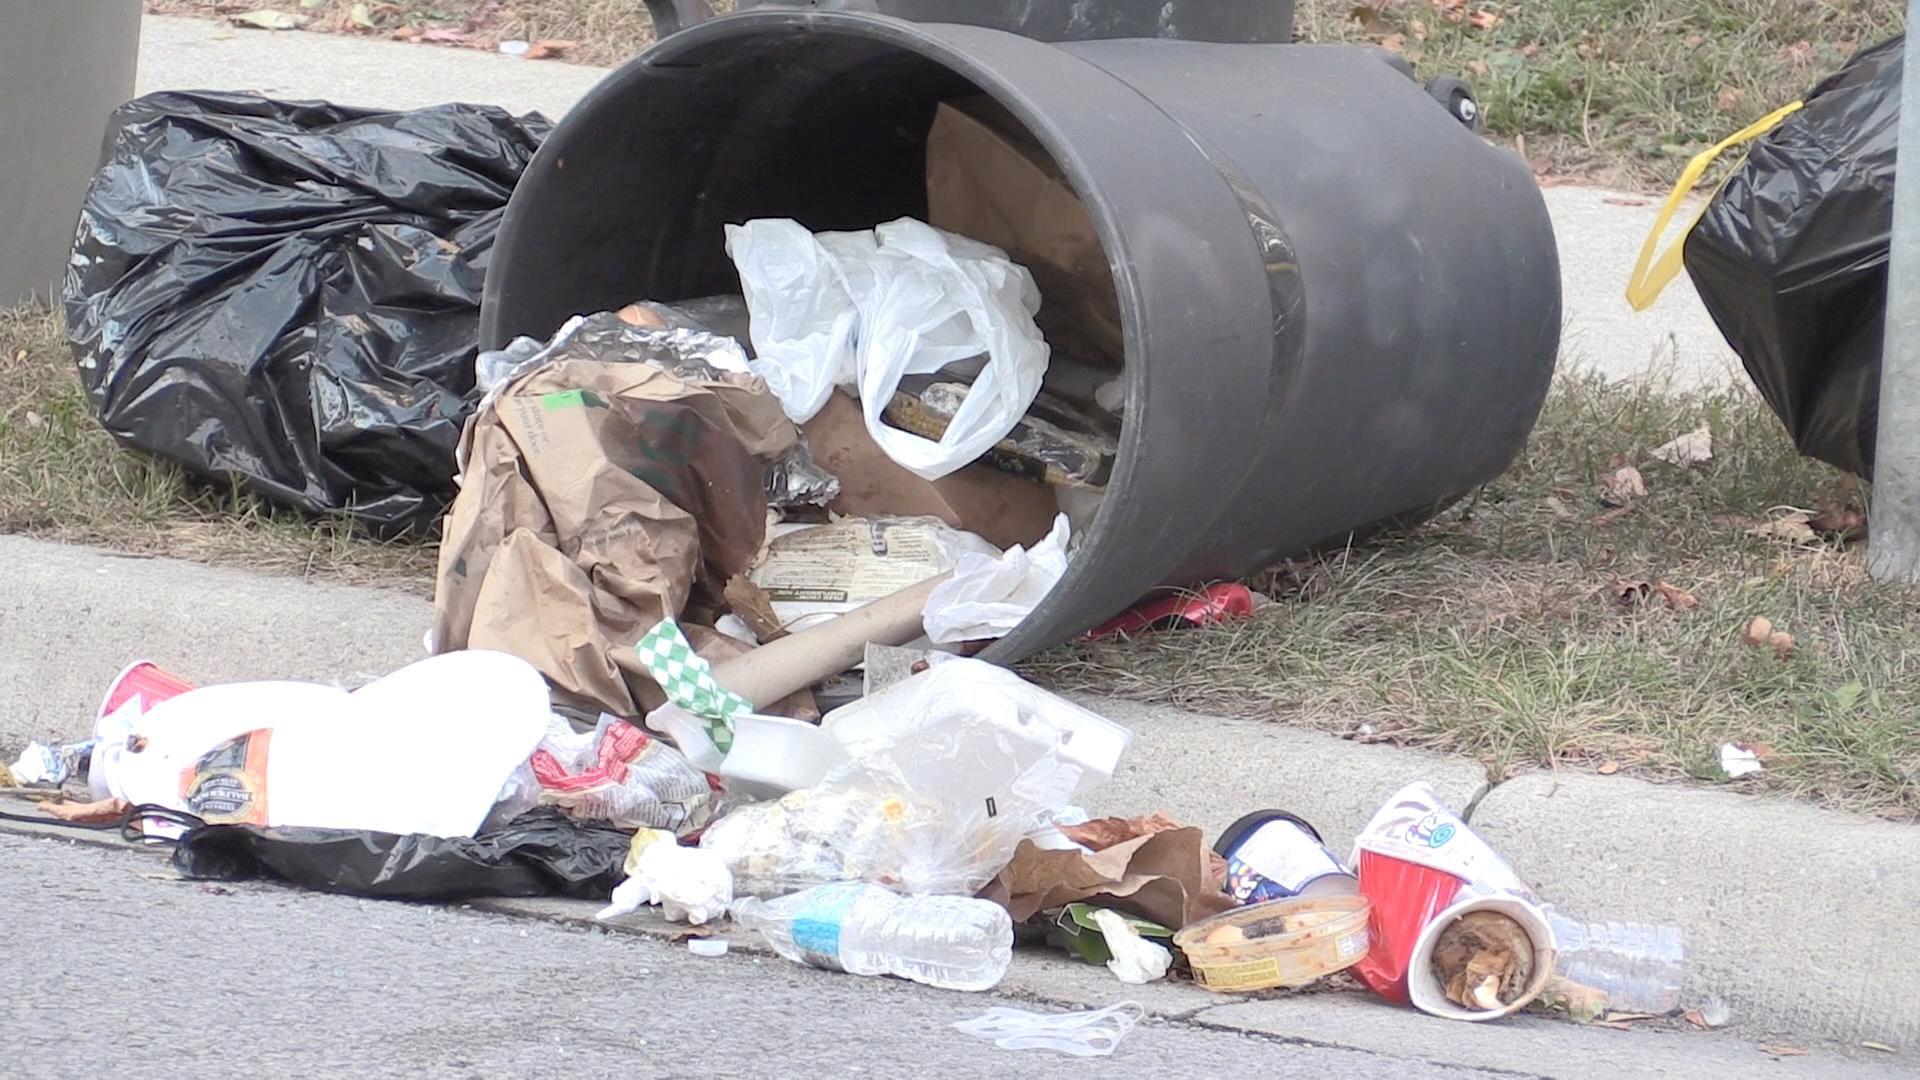 Student street or garbage dump